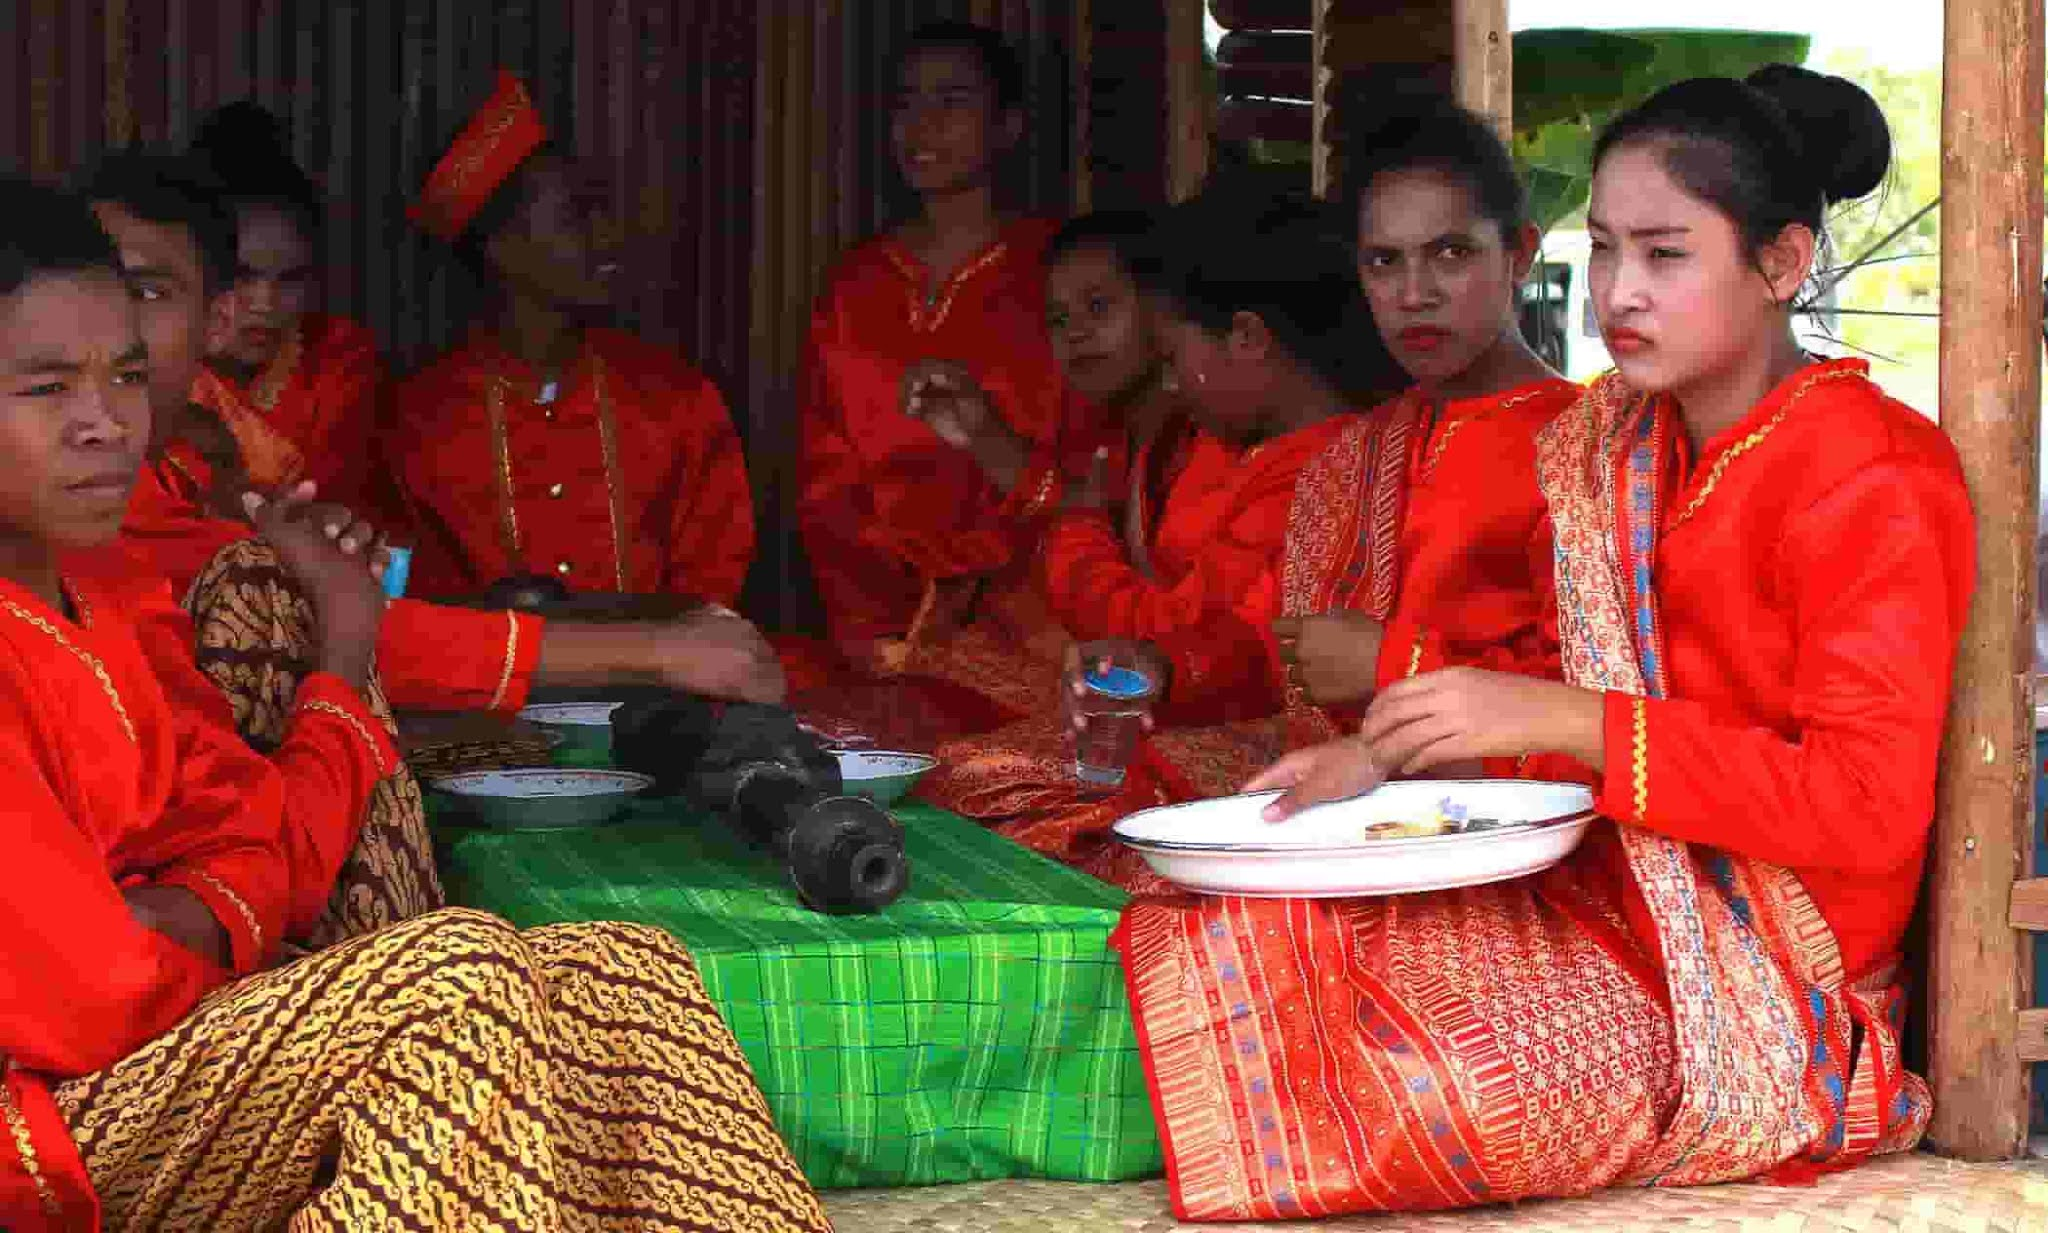 Budaya Masyakat Suku Kei: Maren, Yelim dan Sdov